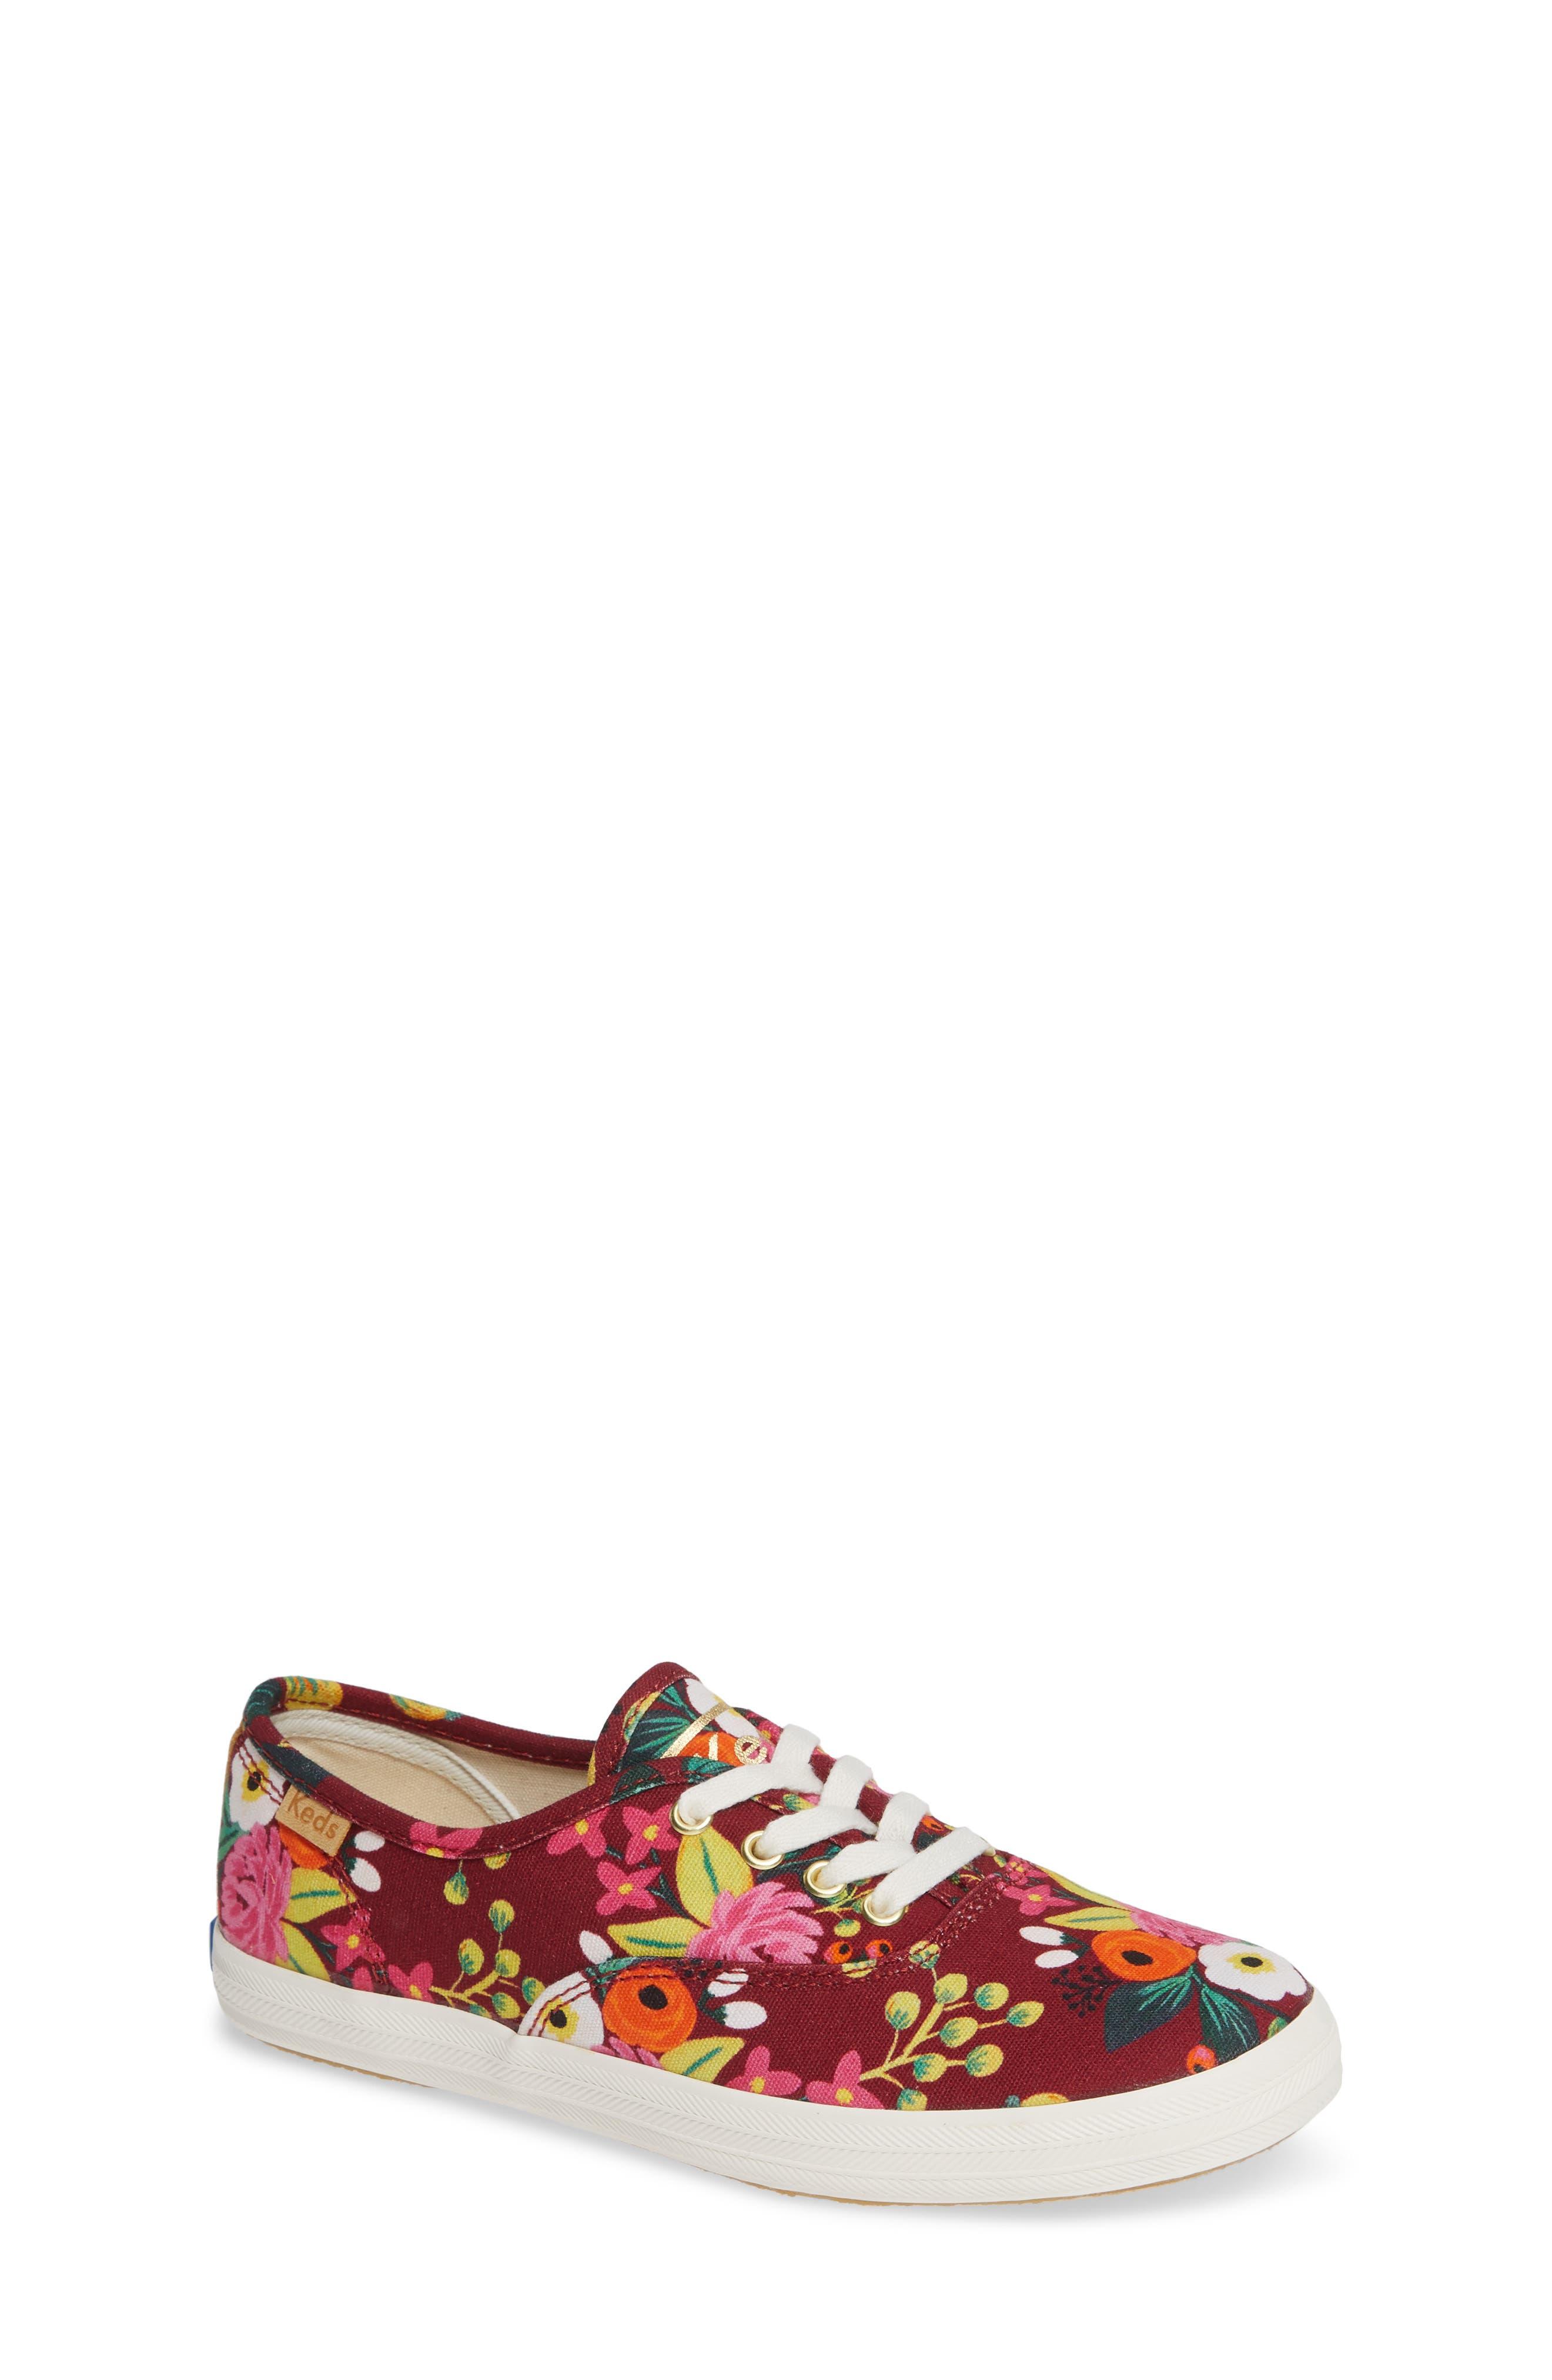 x Rifle Paper Co. Floral Print Champion Sneaker,                             Main thumbnail 1, color,                             VINTAGE BLOSSOM